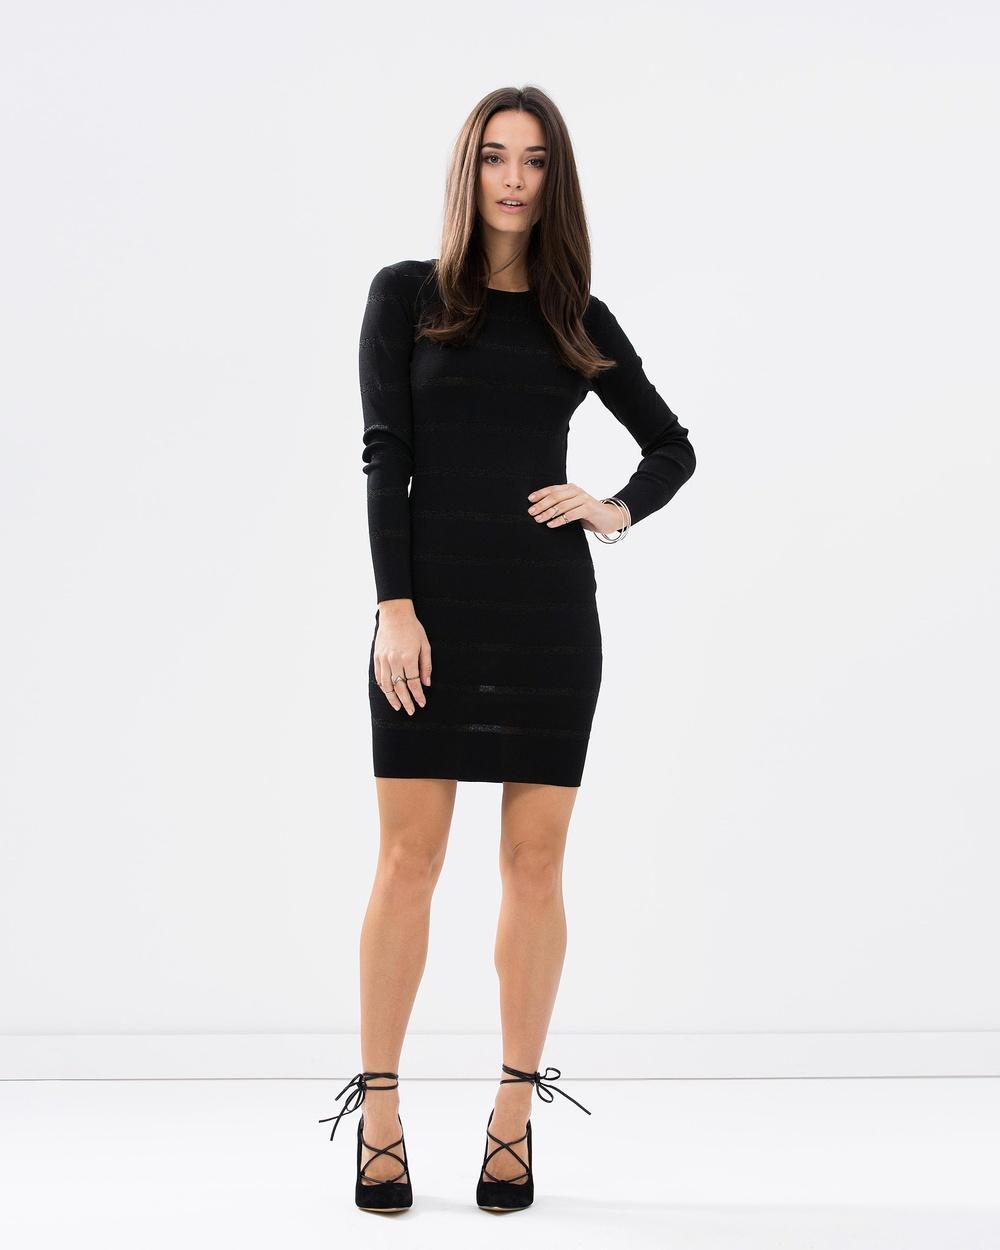 b0e82ae314 Long Sleeve Black Tight Sexy bodycon Knitted Dress for women / Women's Sexy  Bodycon Knitted Dress